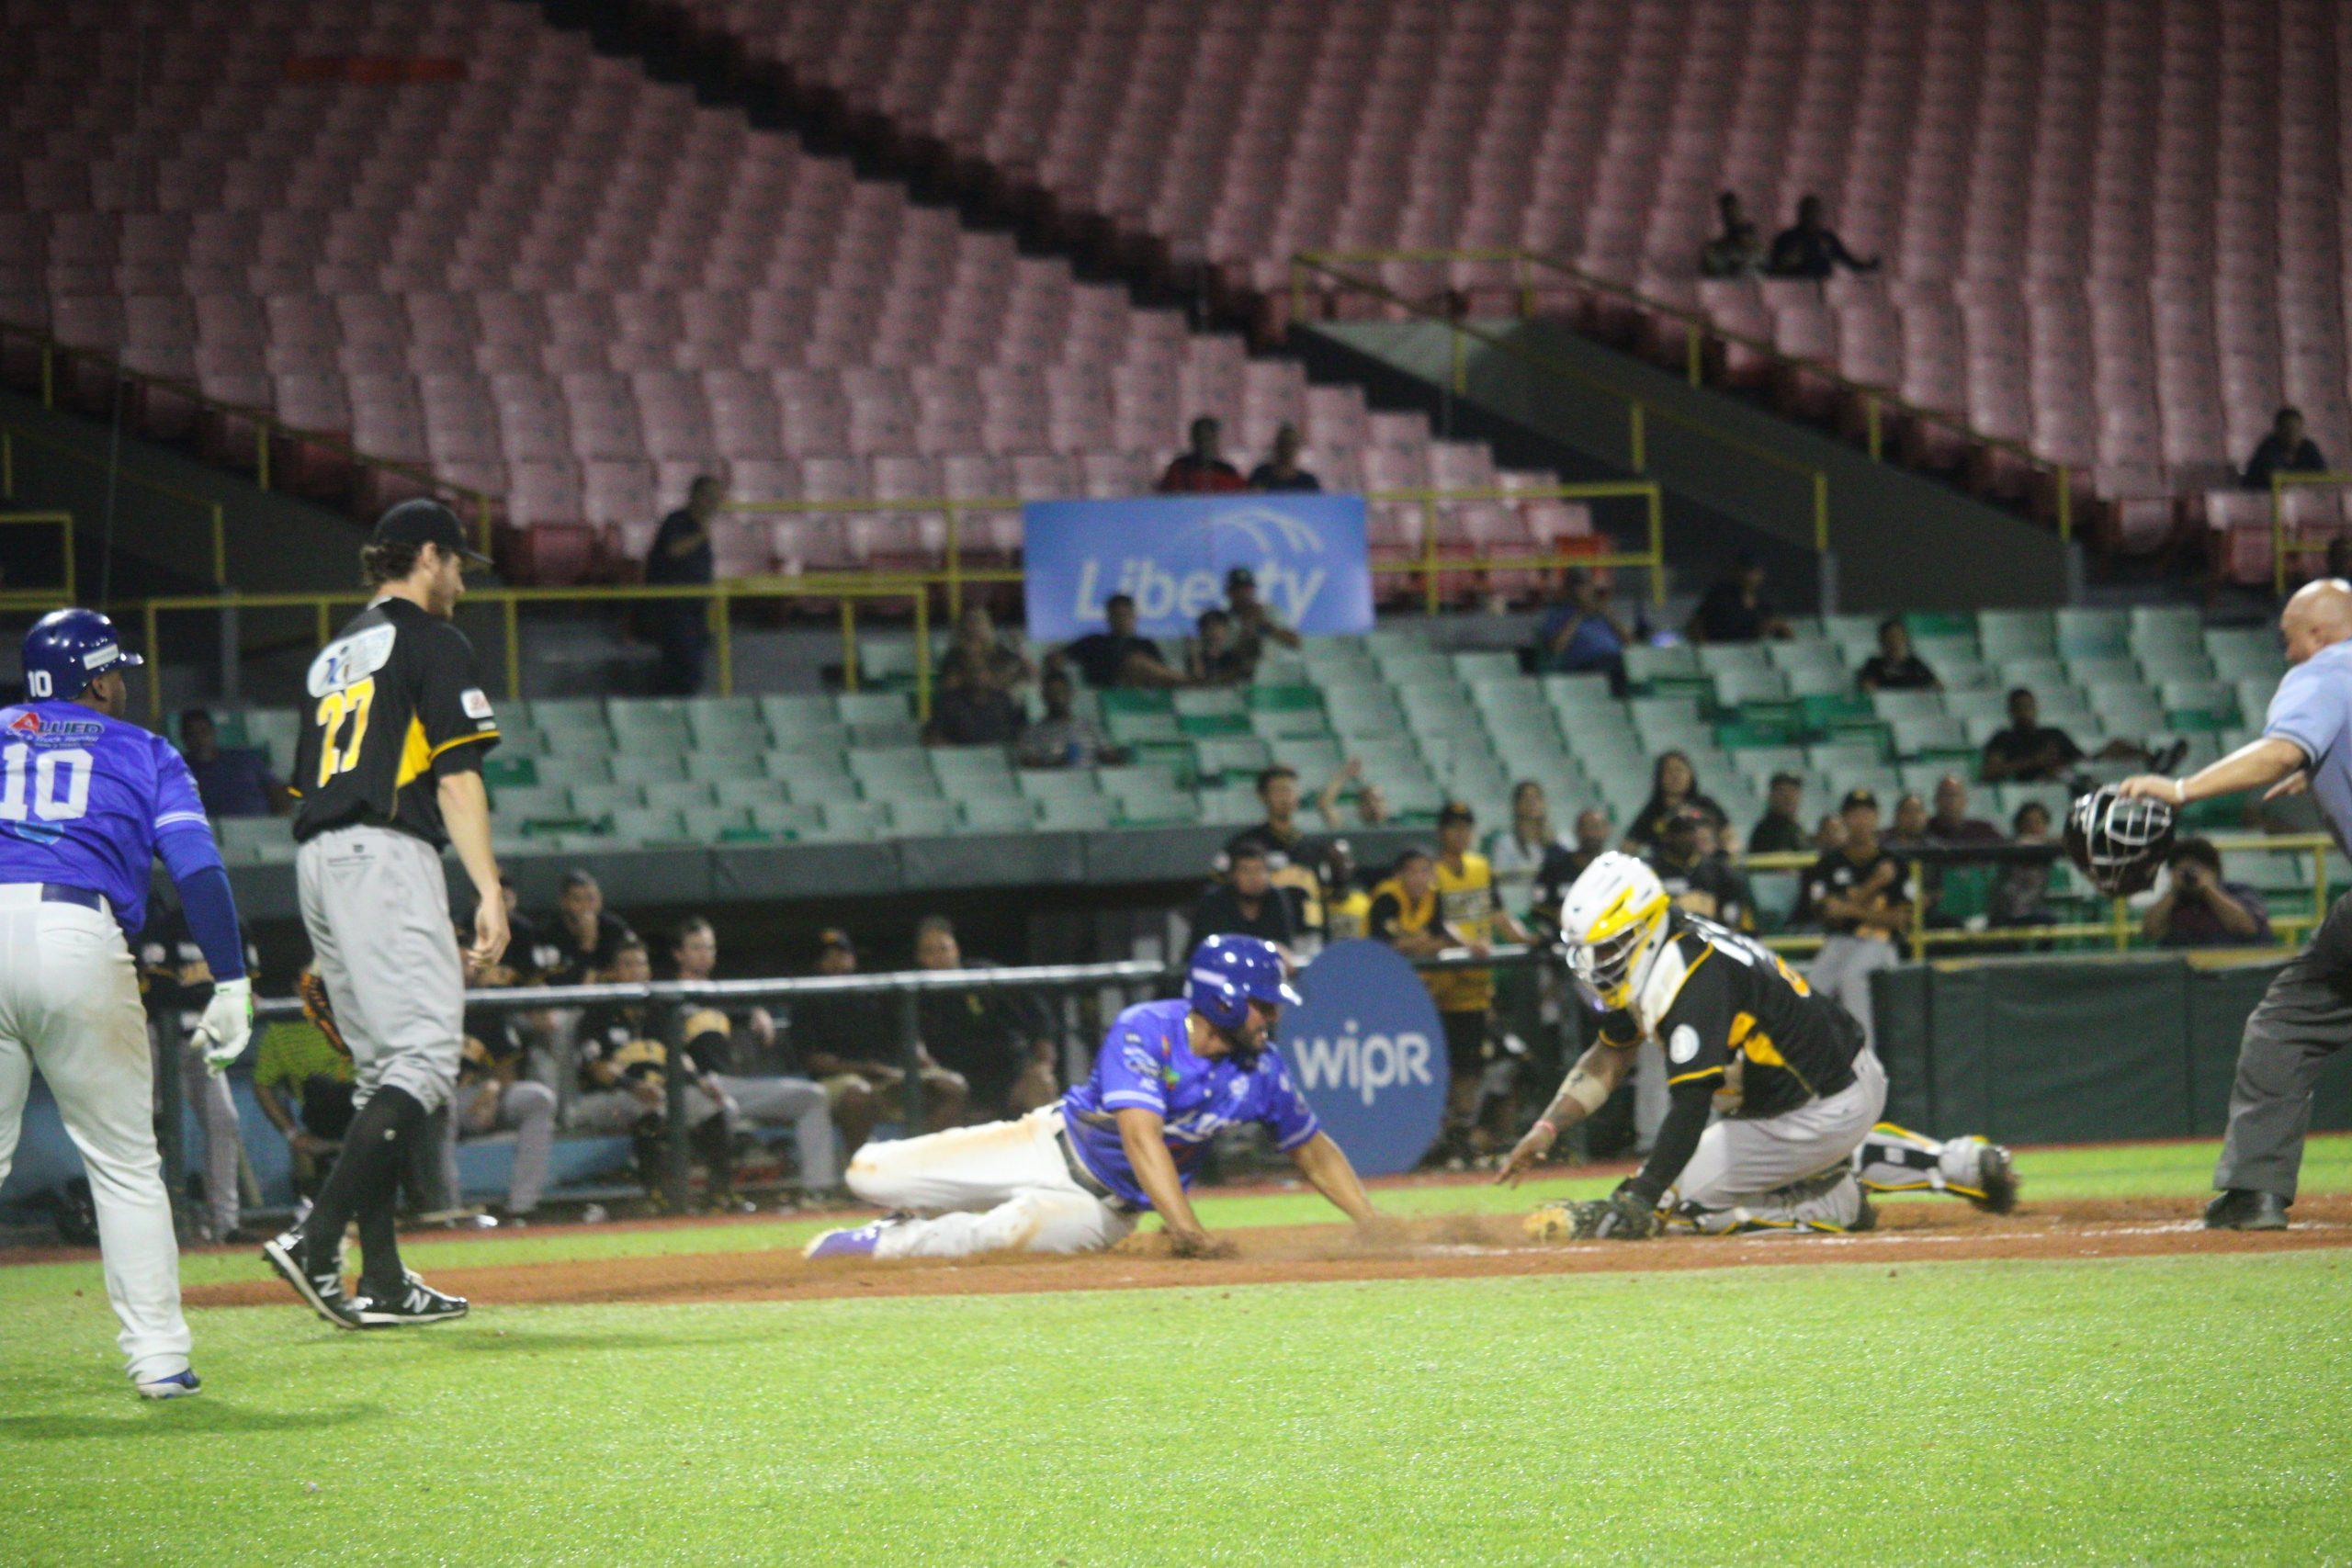 Reymond Fuentes anota carrera de la victoria